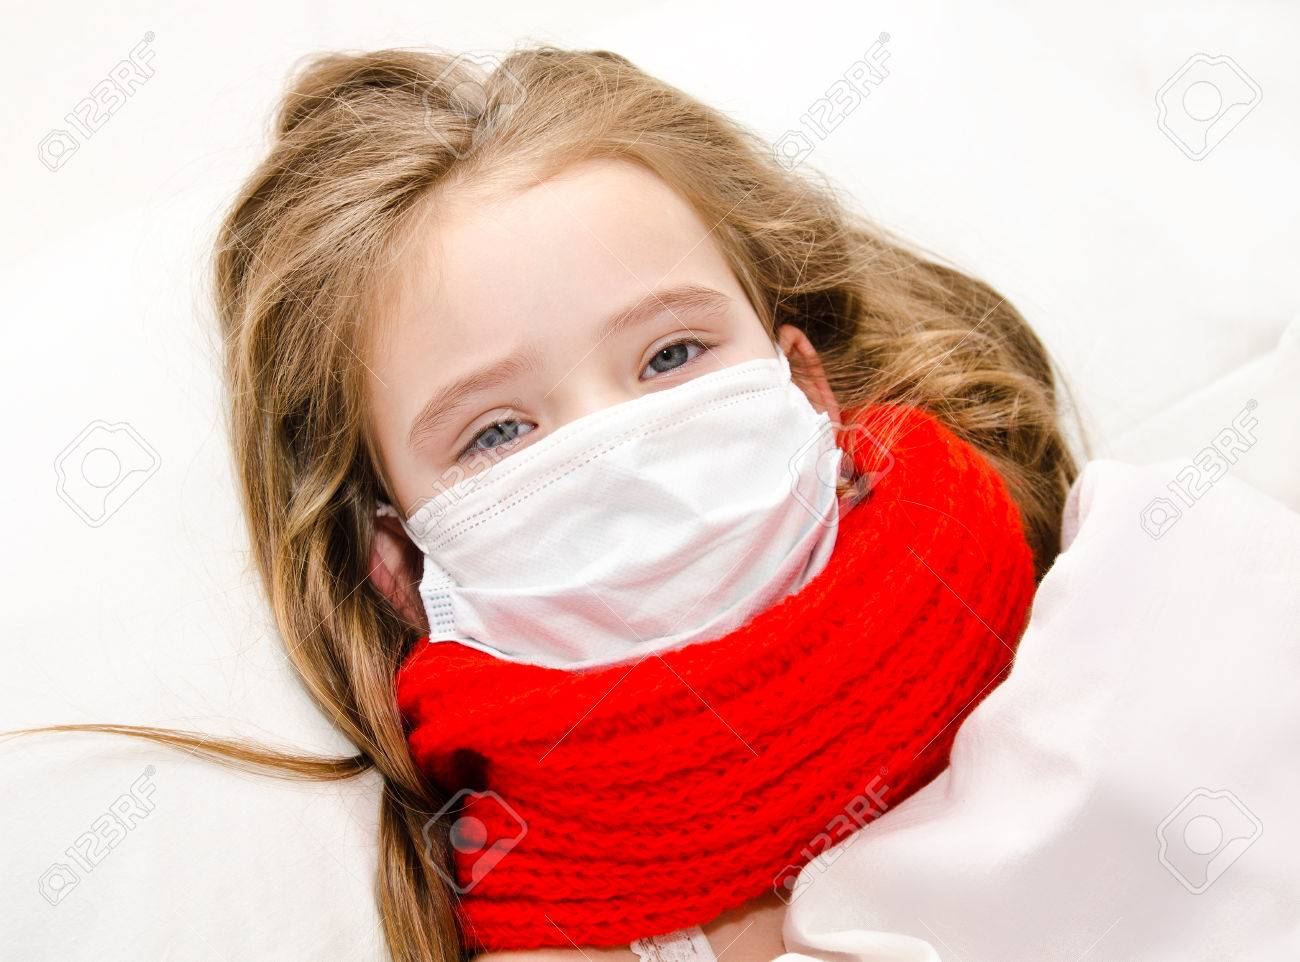 toddler face mask virus